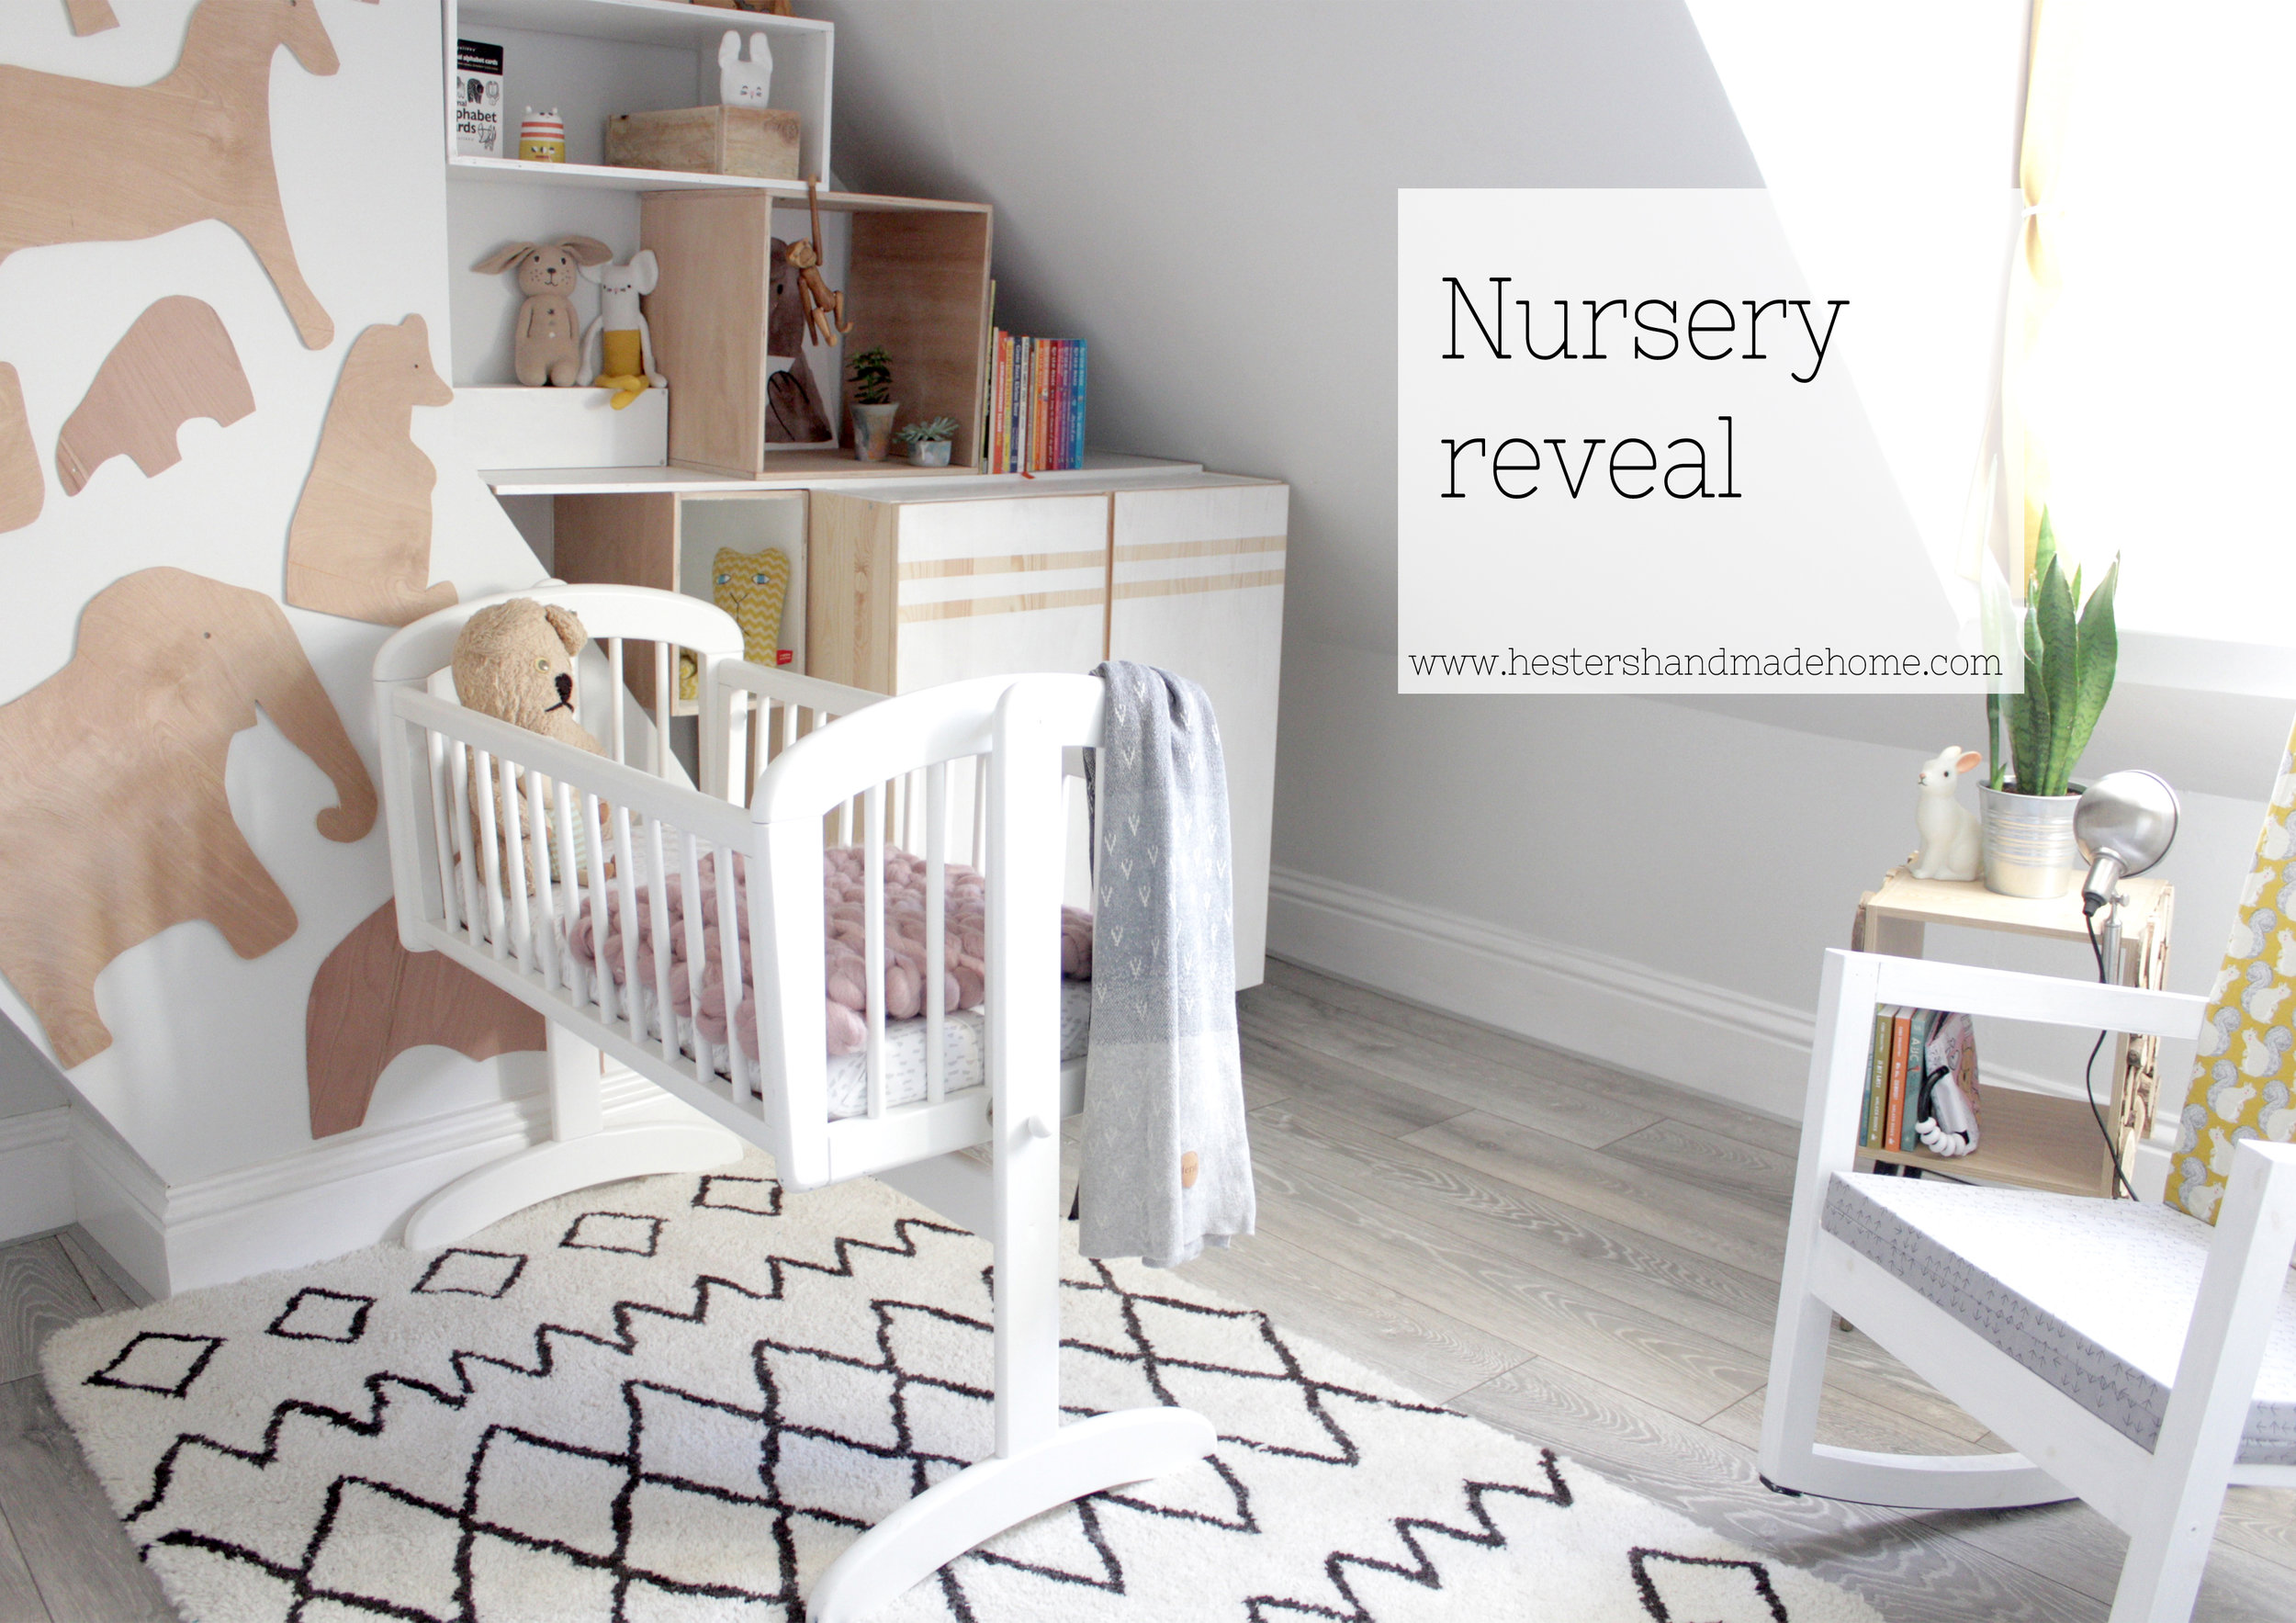 Nursery reveal www.hestershandmadehome.com